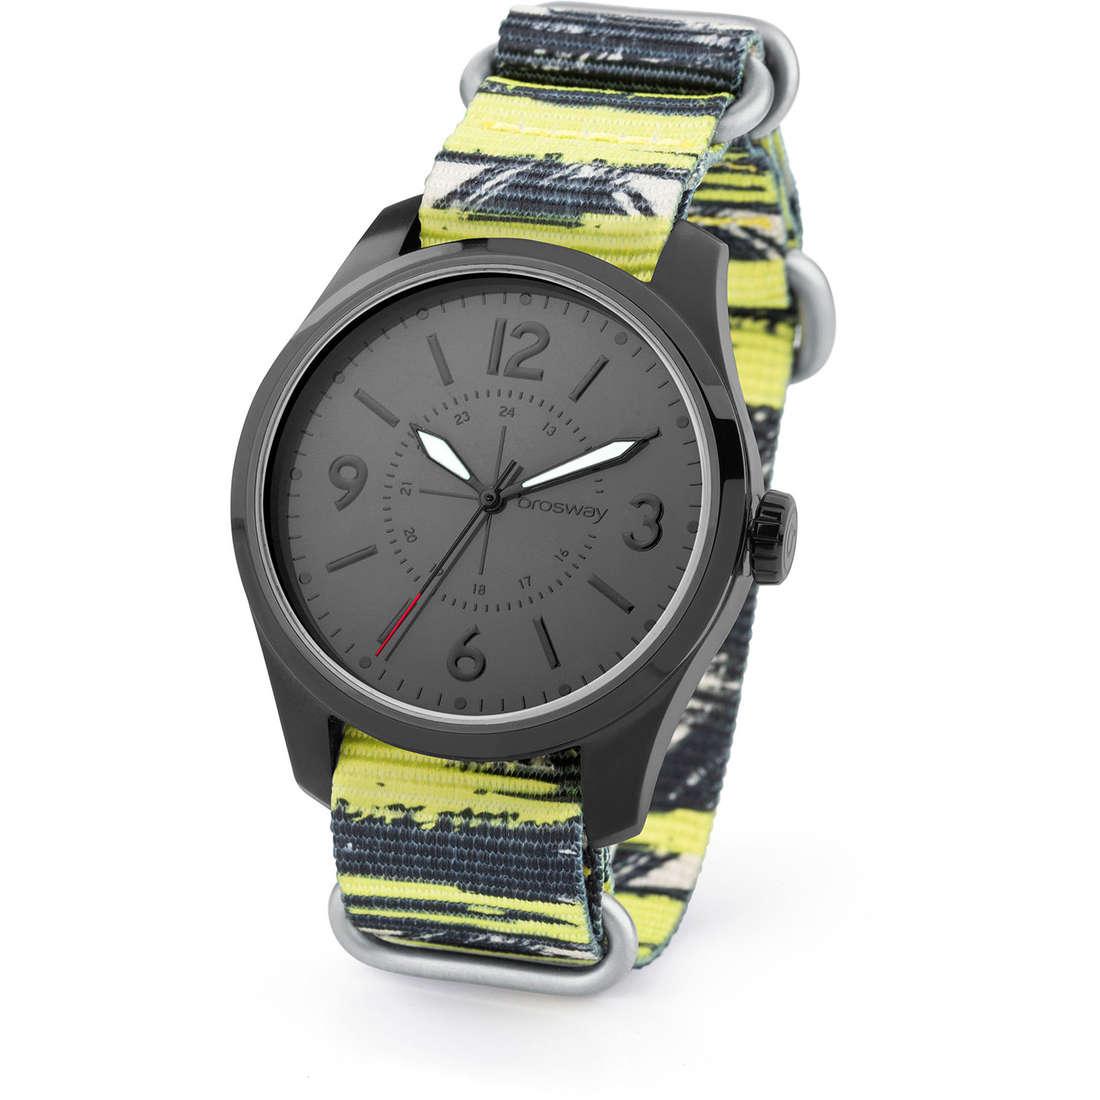 orologio solo tempo uomo Brosway W2 WW210